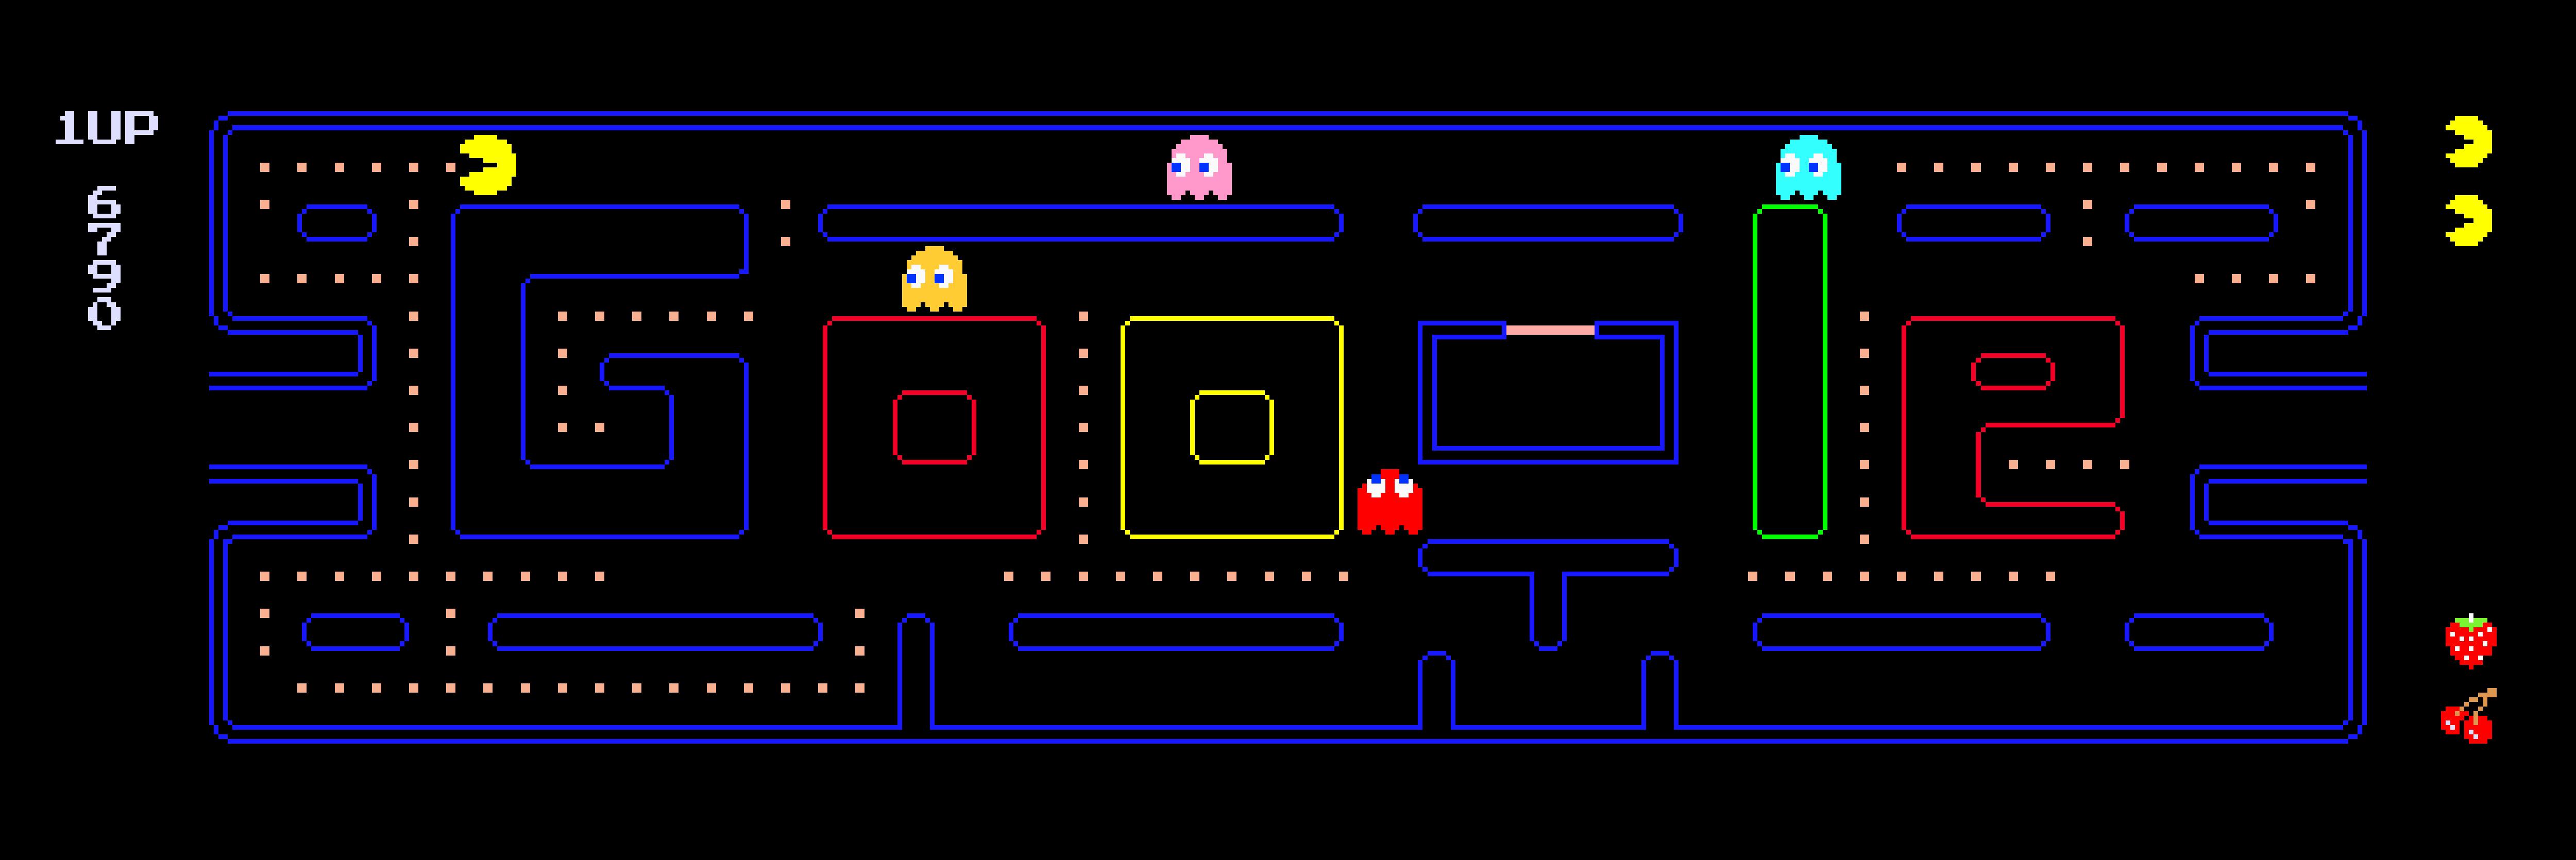 Logo de Google con PacMan